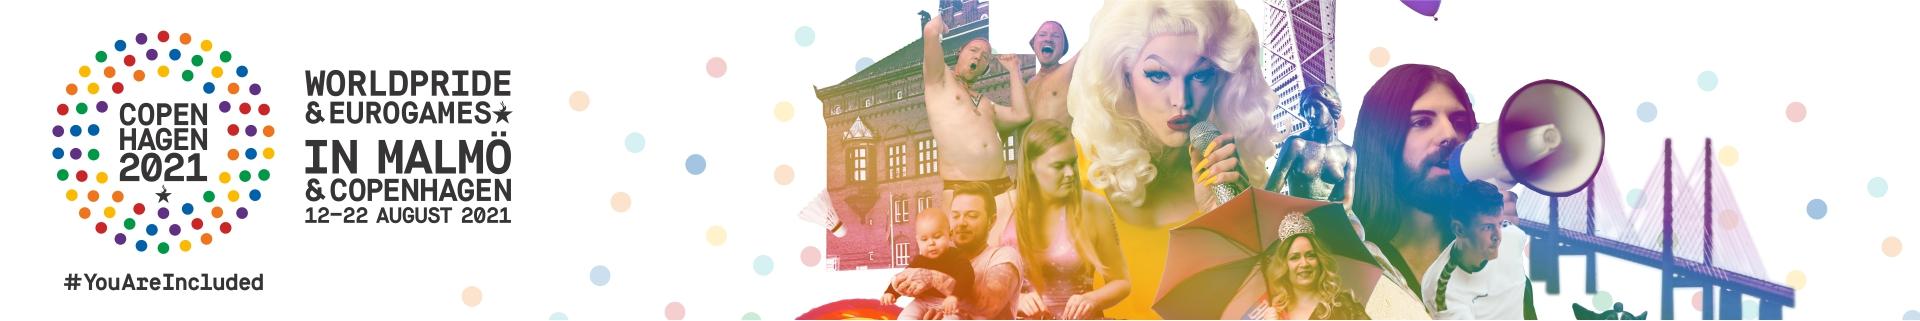 Header image for WorldPride and EuroGames 2021